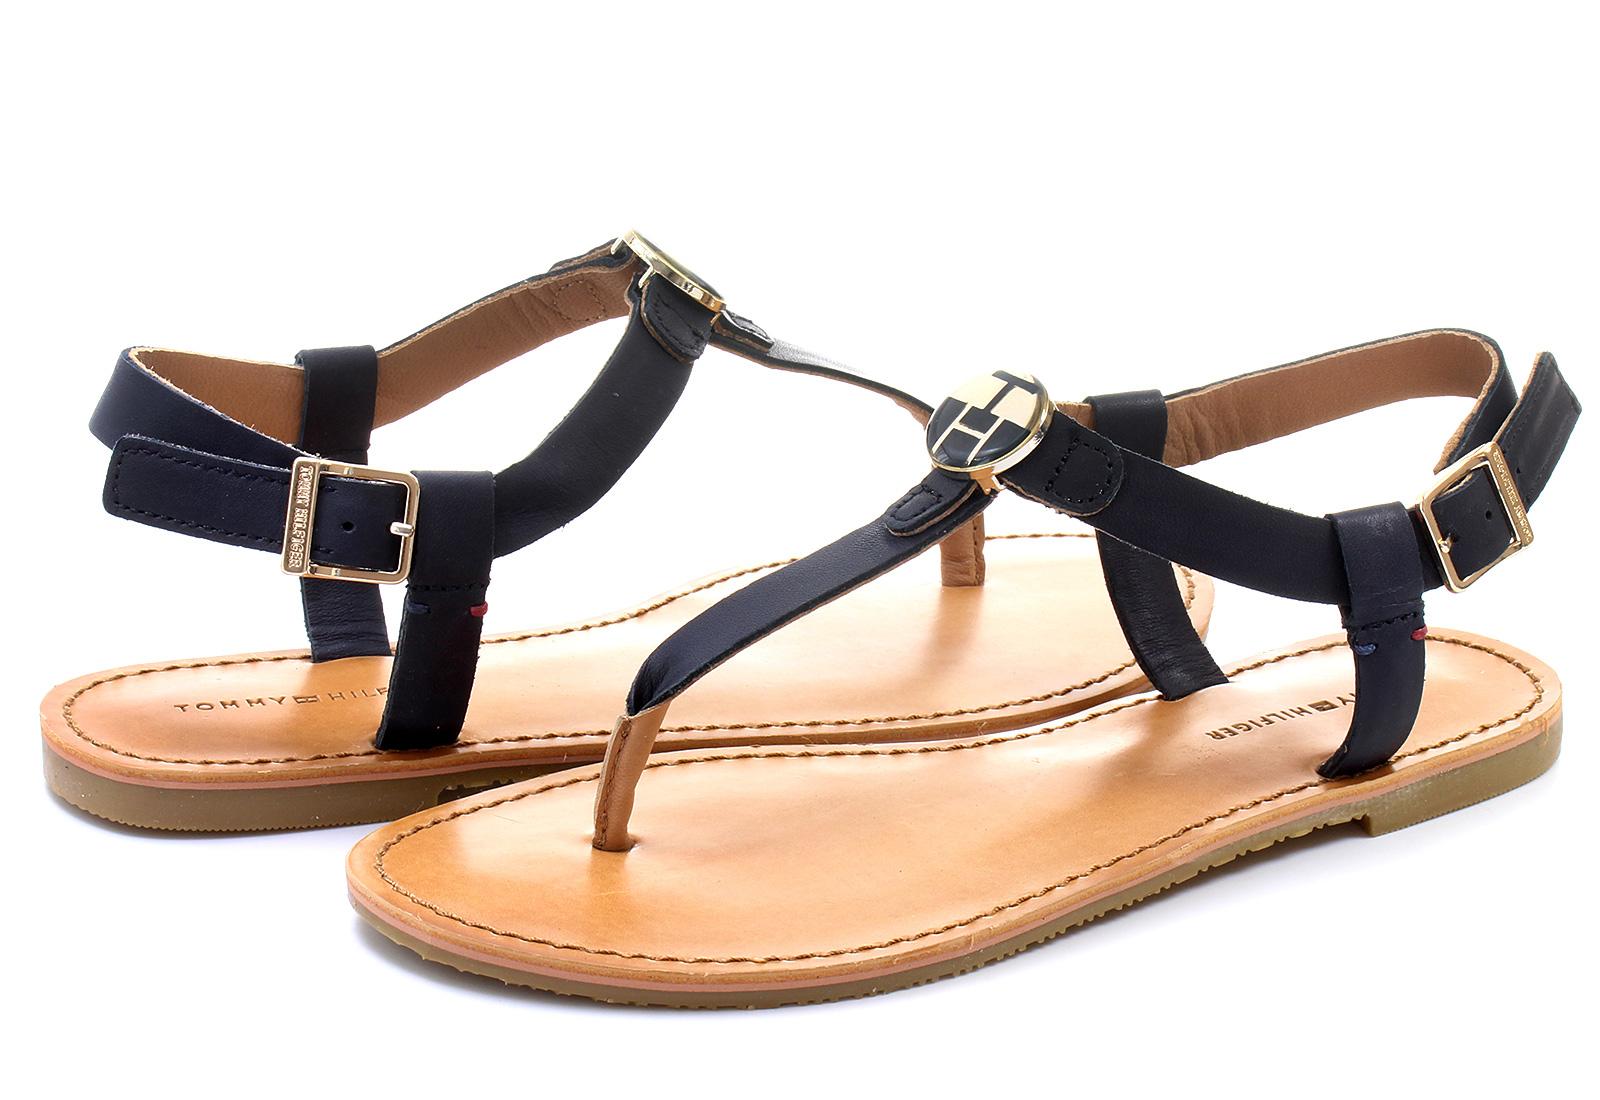 Tommy Hilfiger Sandale. acheter discount sandale tommy hilfiger ... 5d3bd9686d